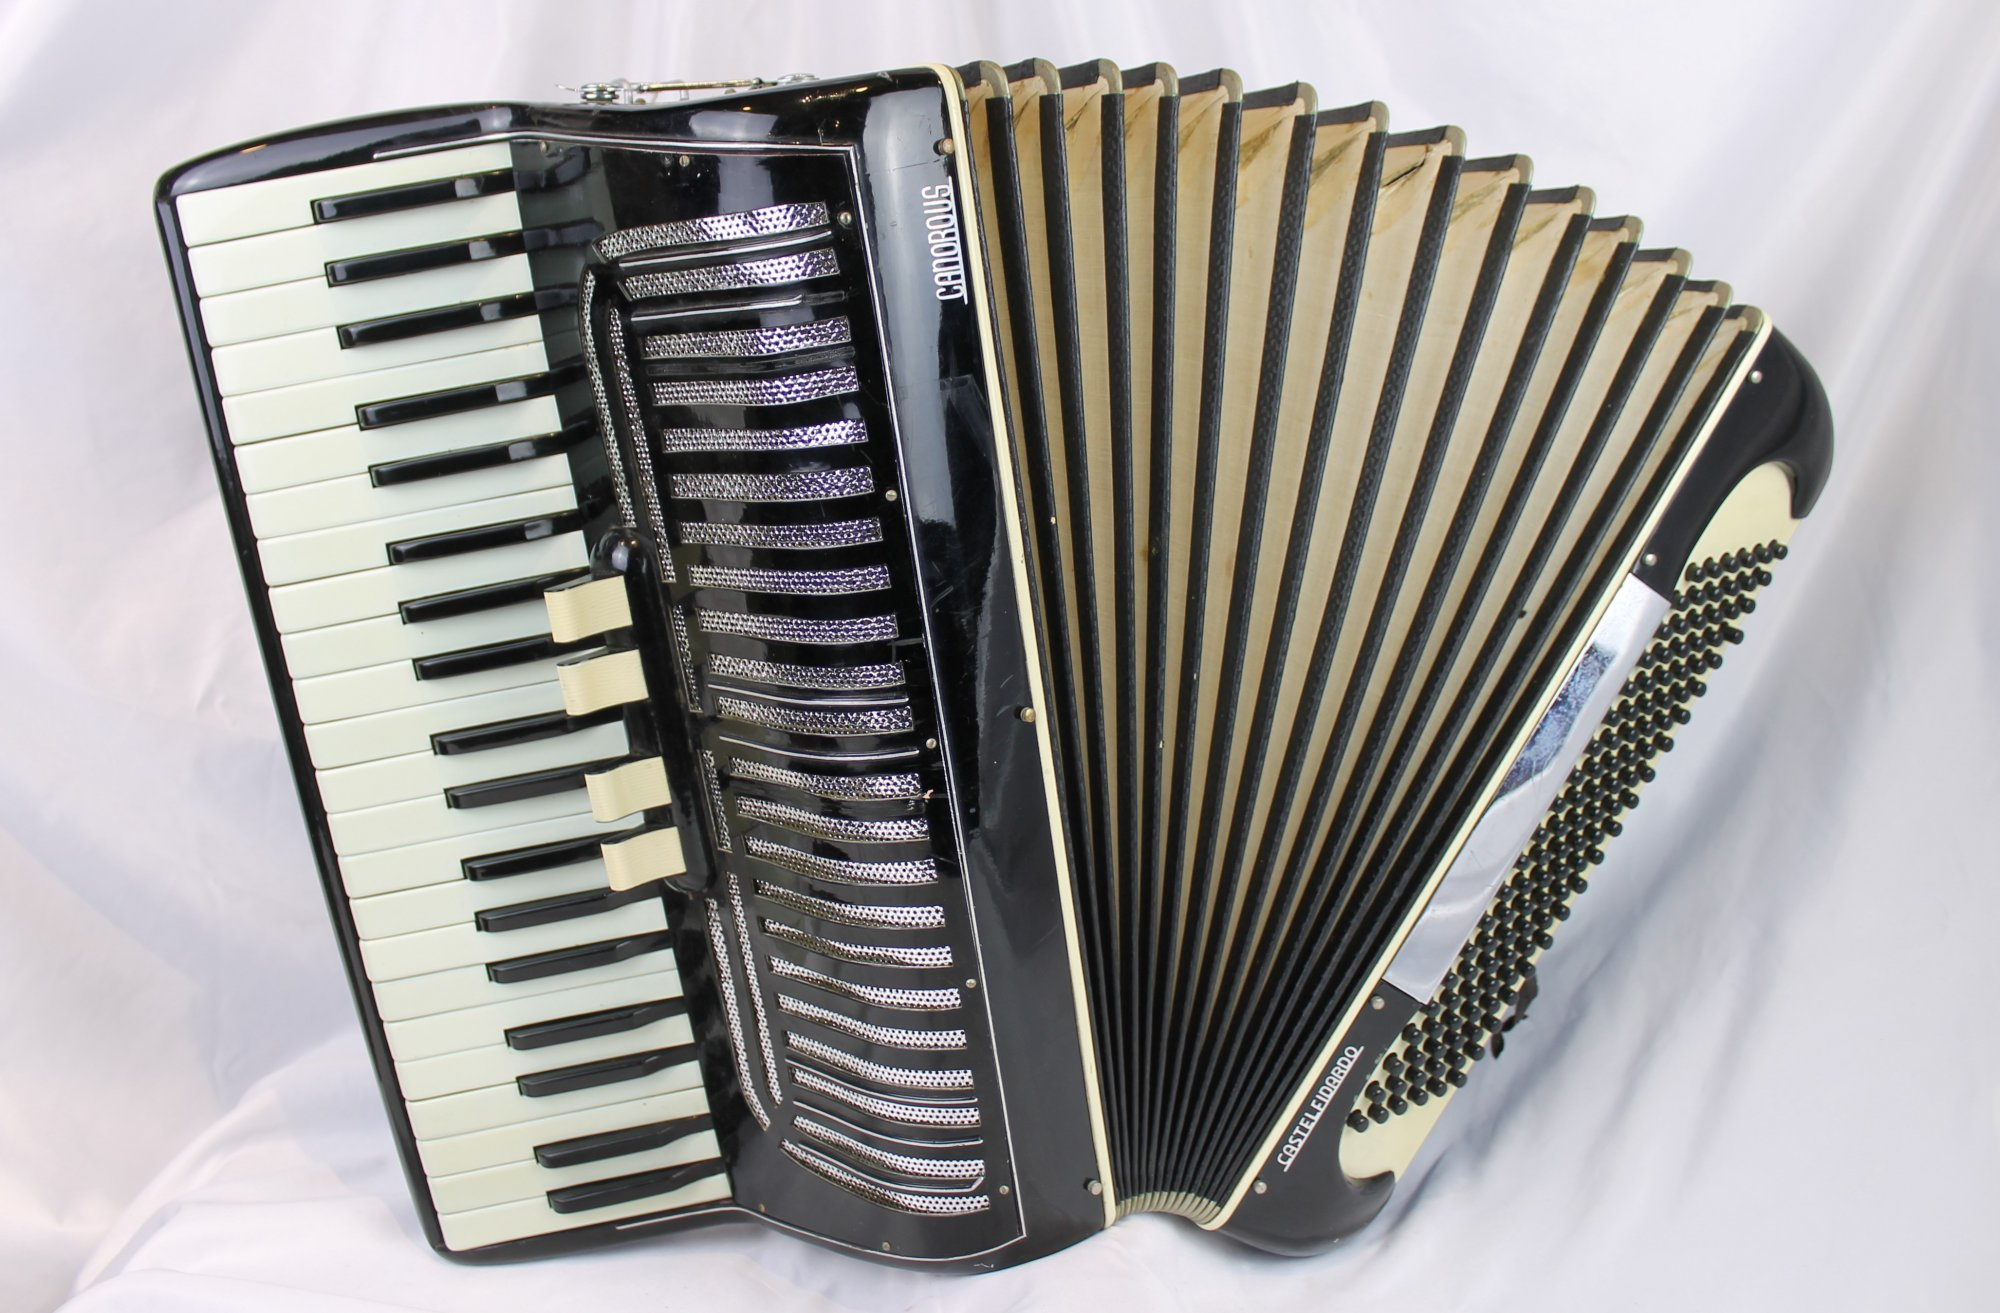 6115 - Black Canorous Piano Accordion LMM 41 120